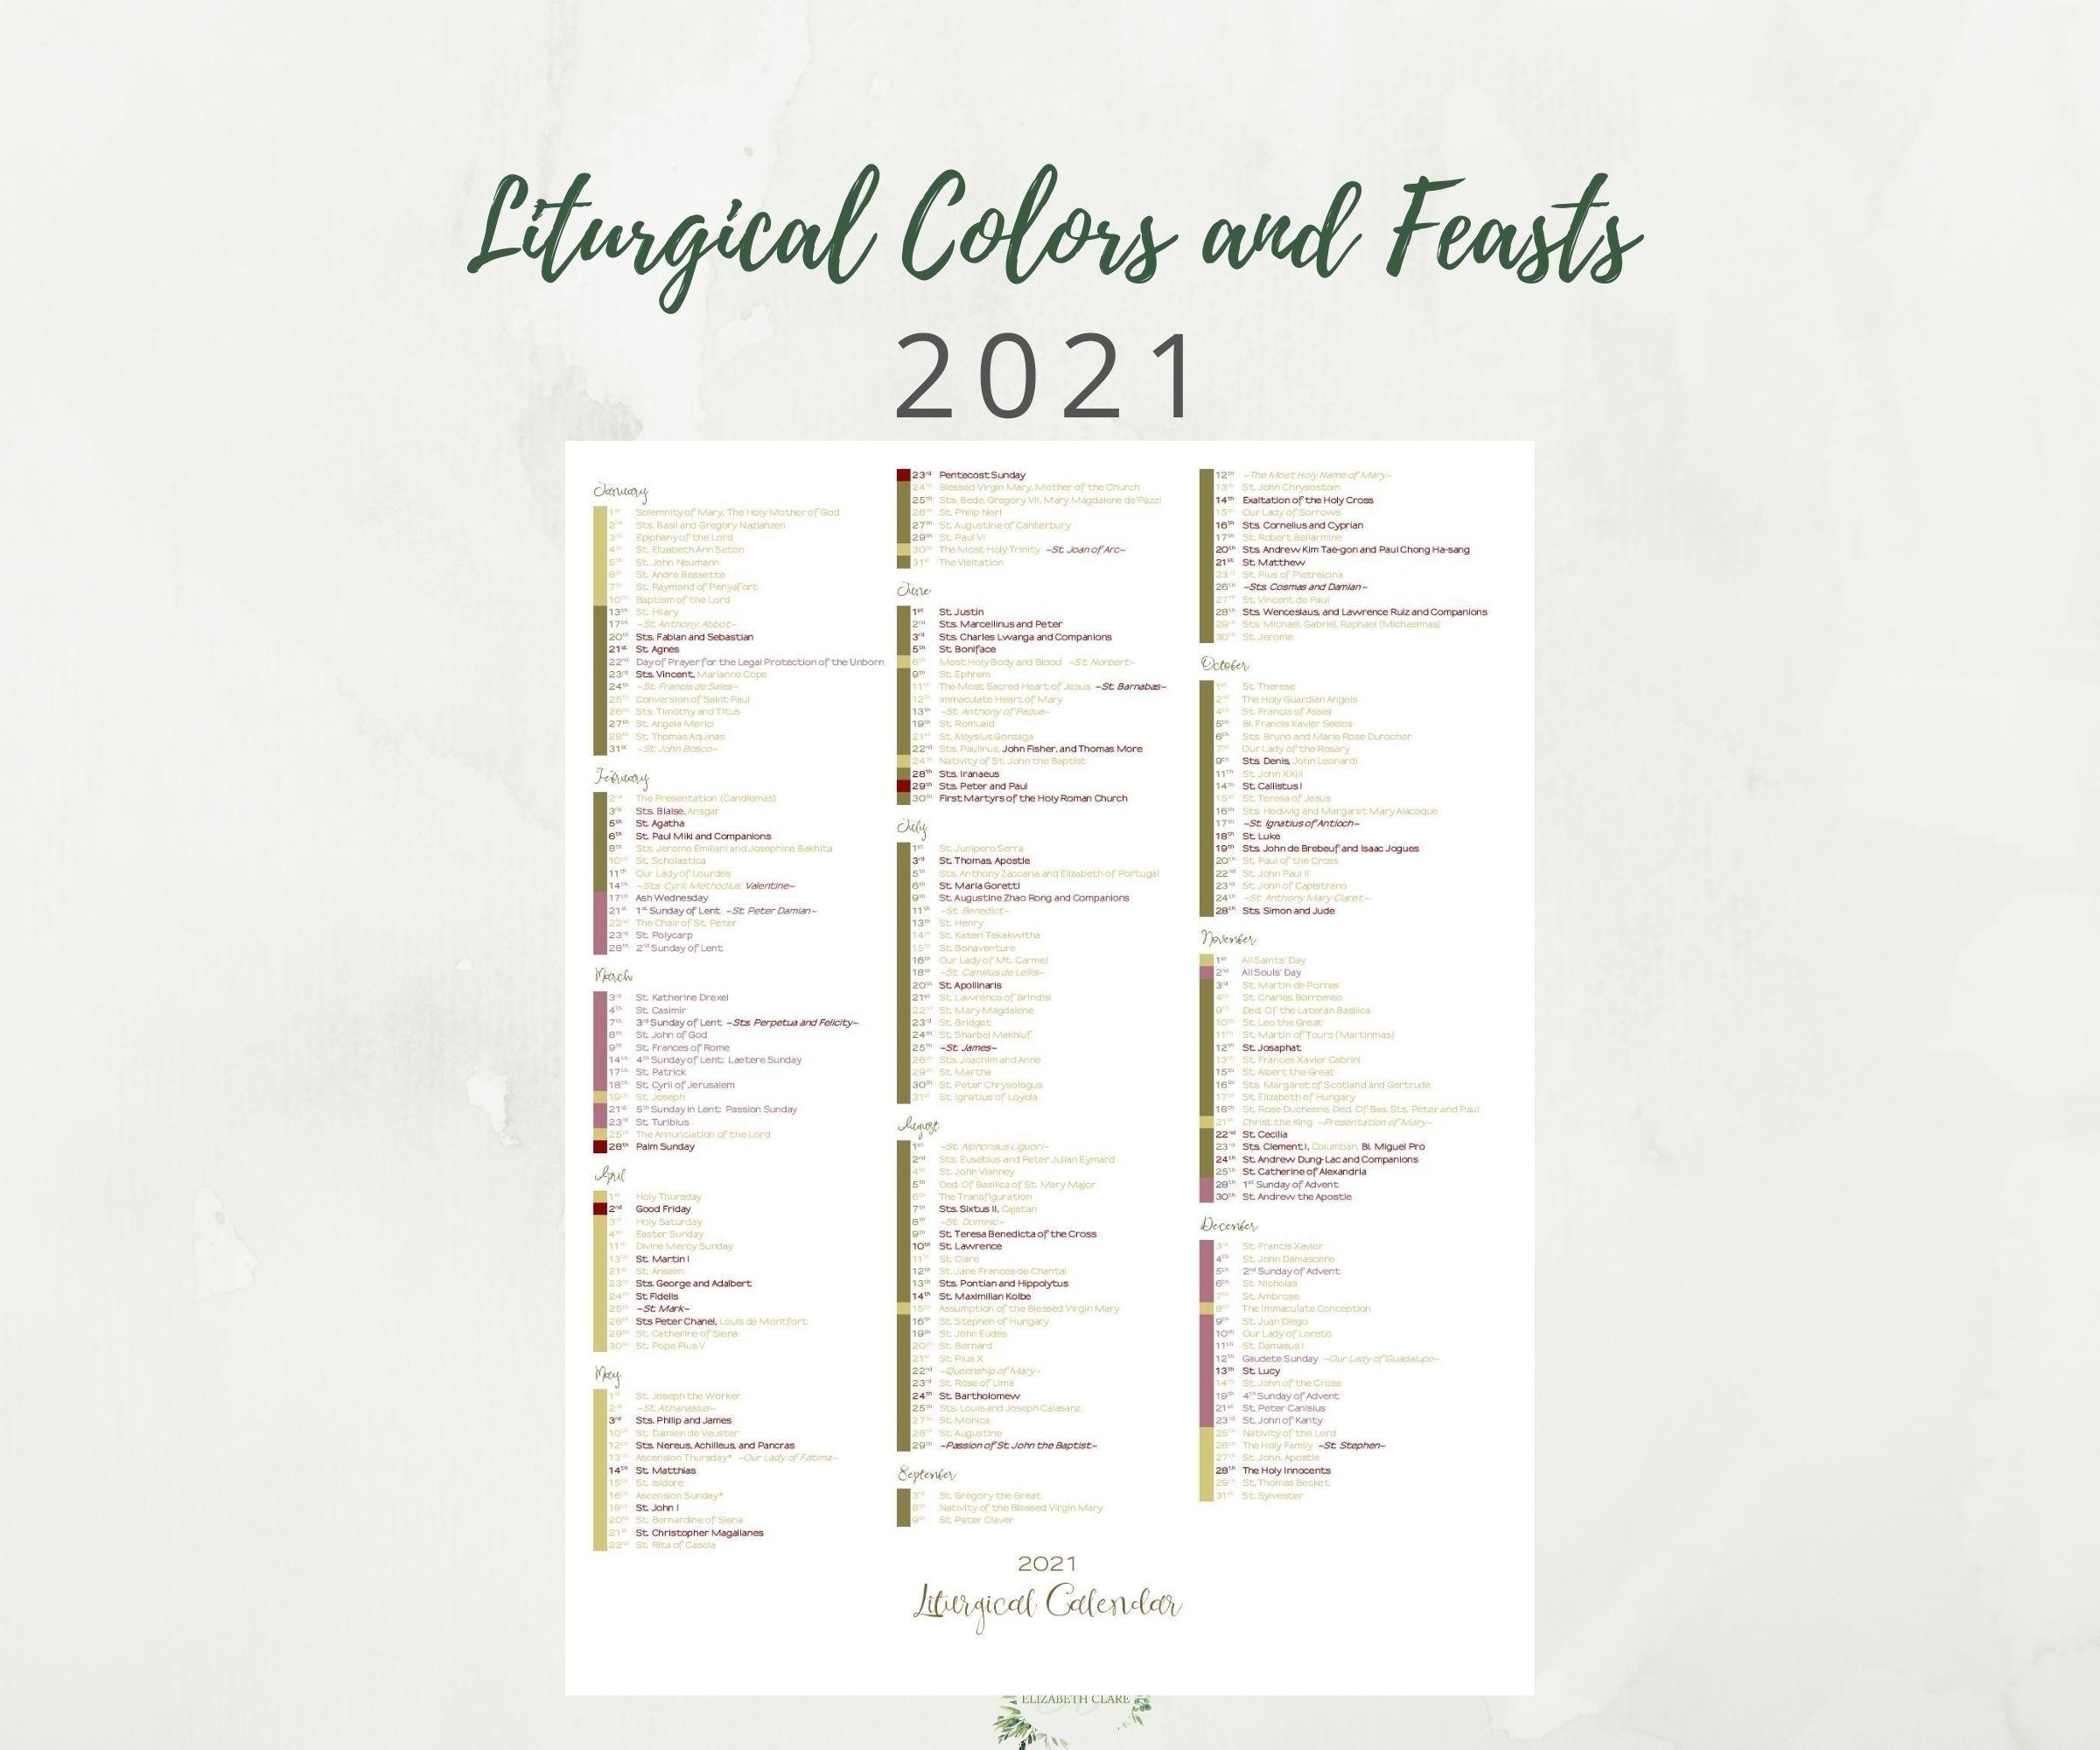 2021 At A Glance Catholic Liturgical Calendar